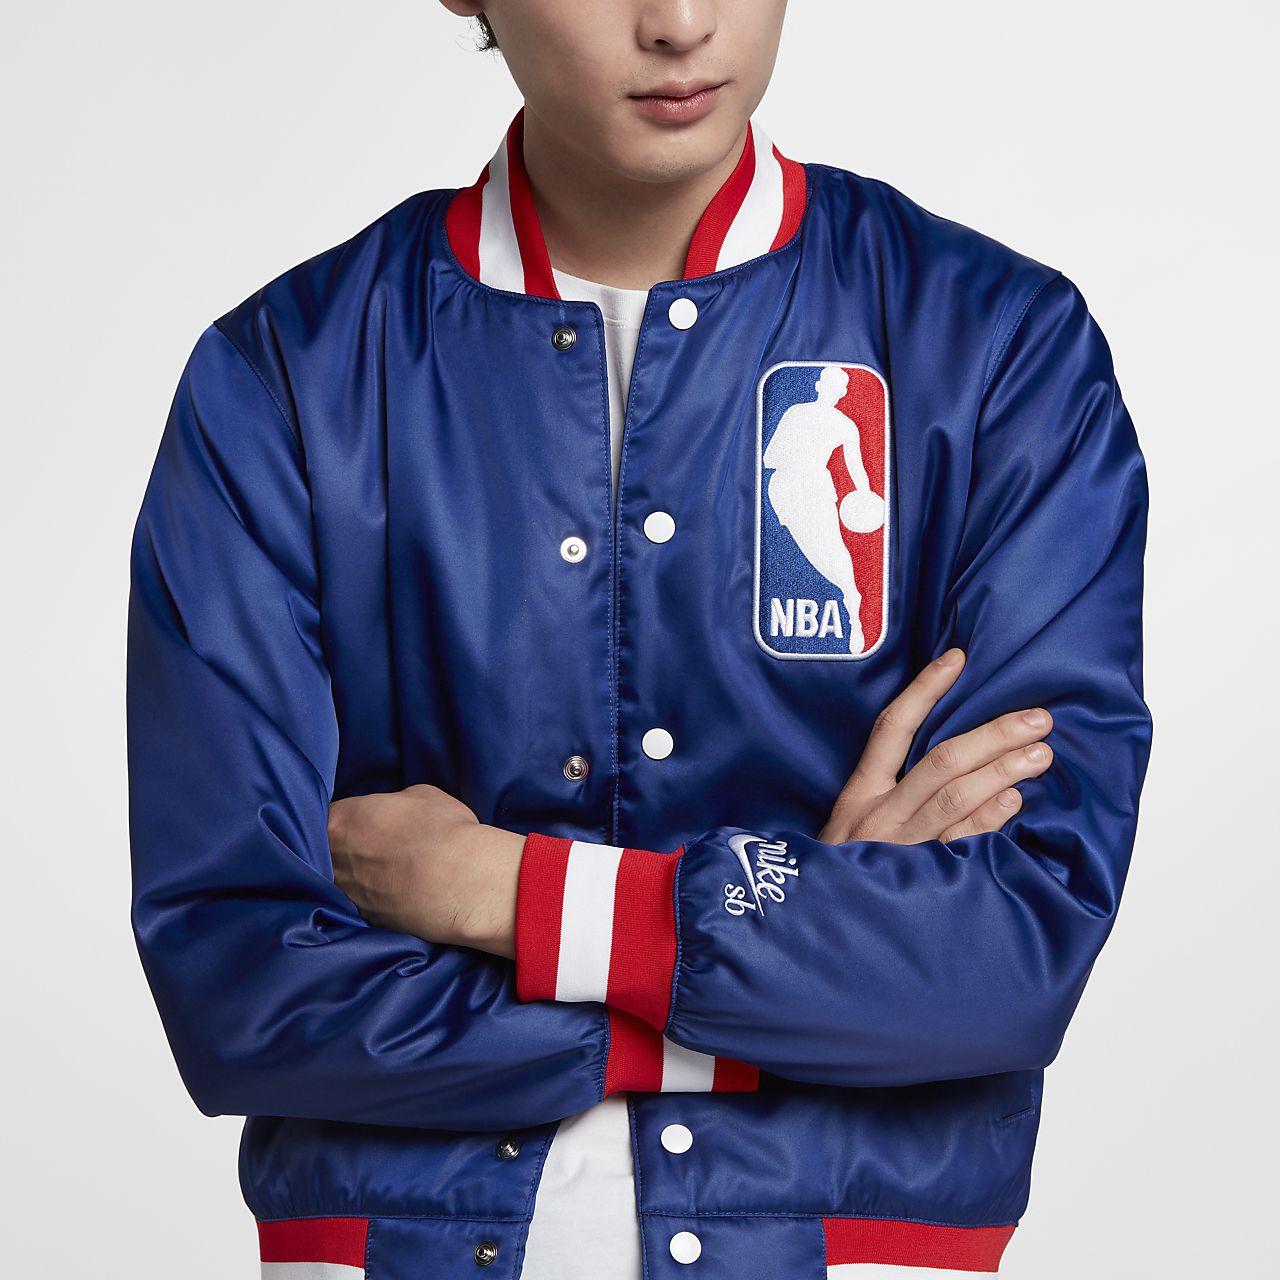 innovative design 684a9 8430f ... Nike SB x NBA Men s Bomber Jacket